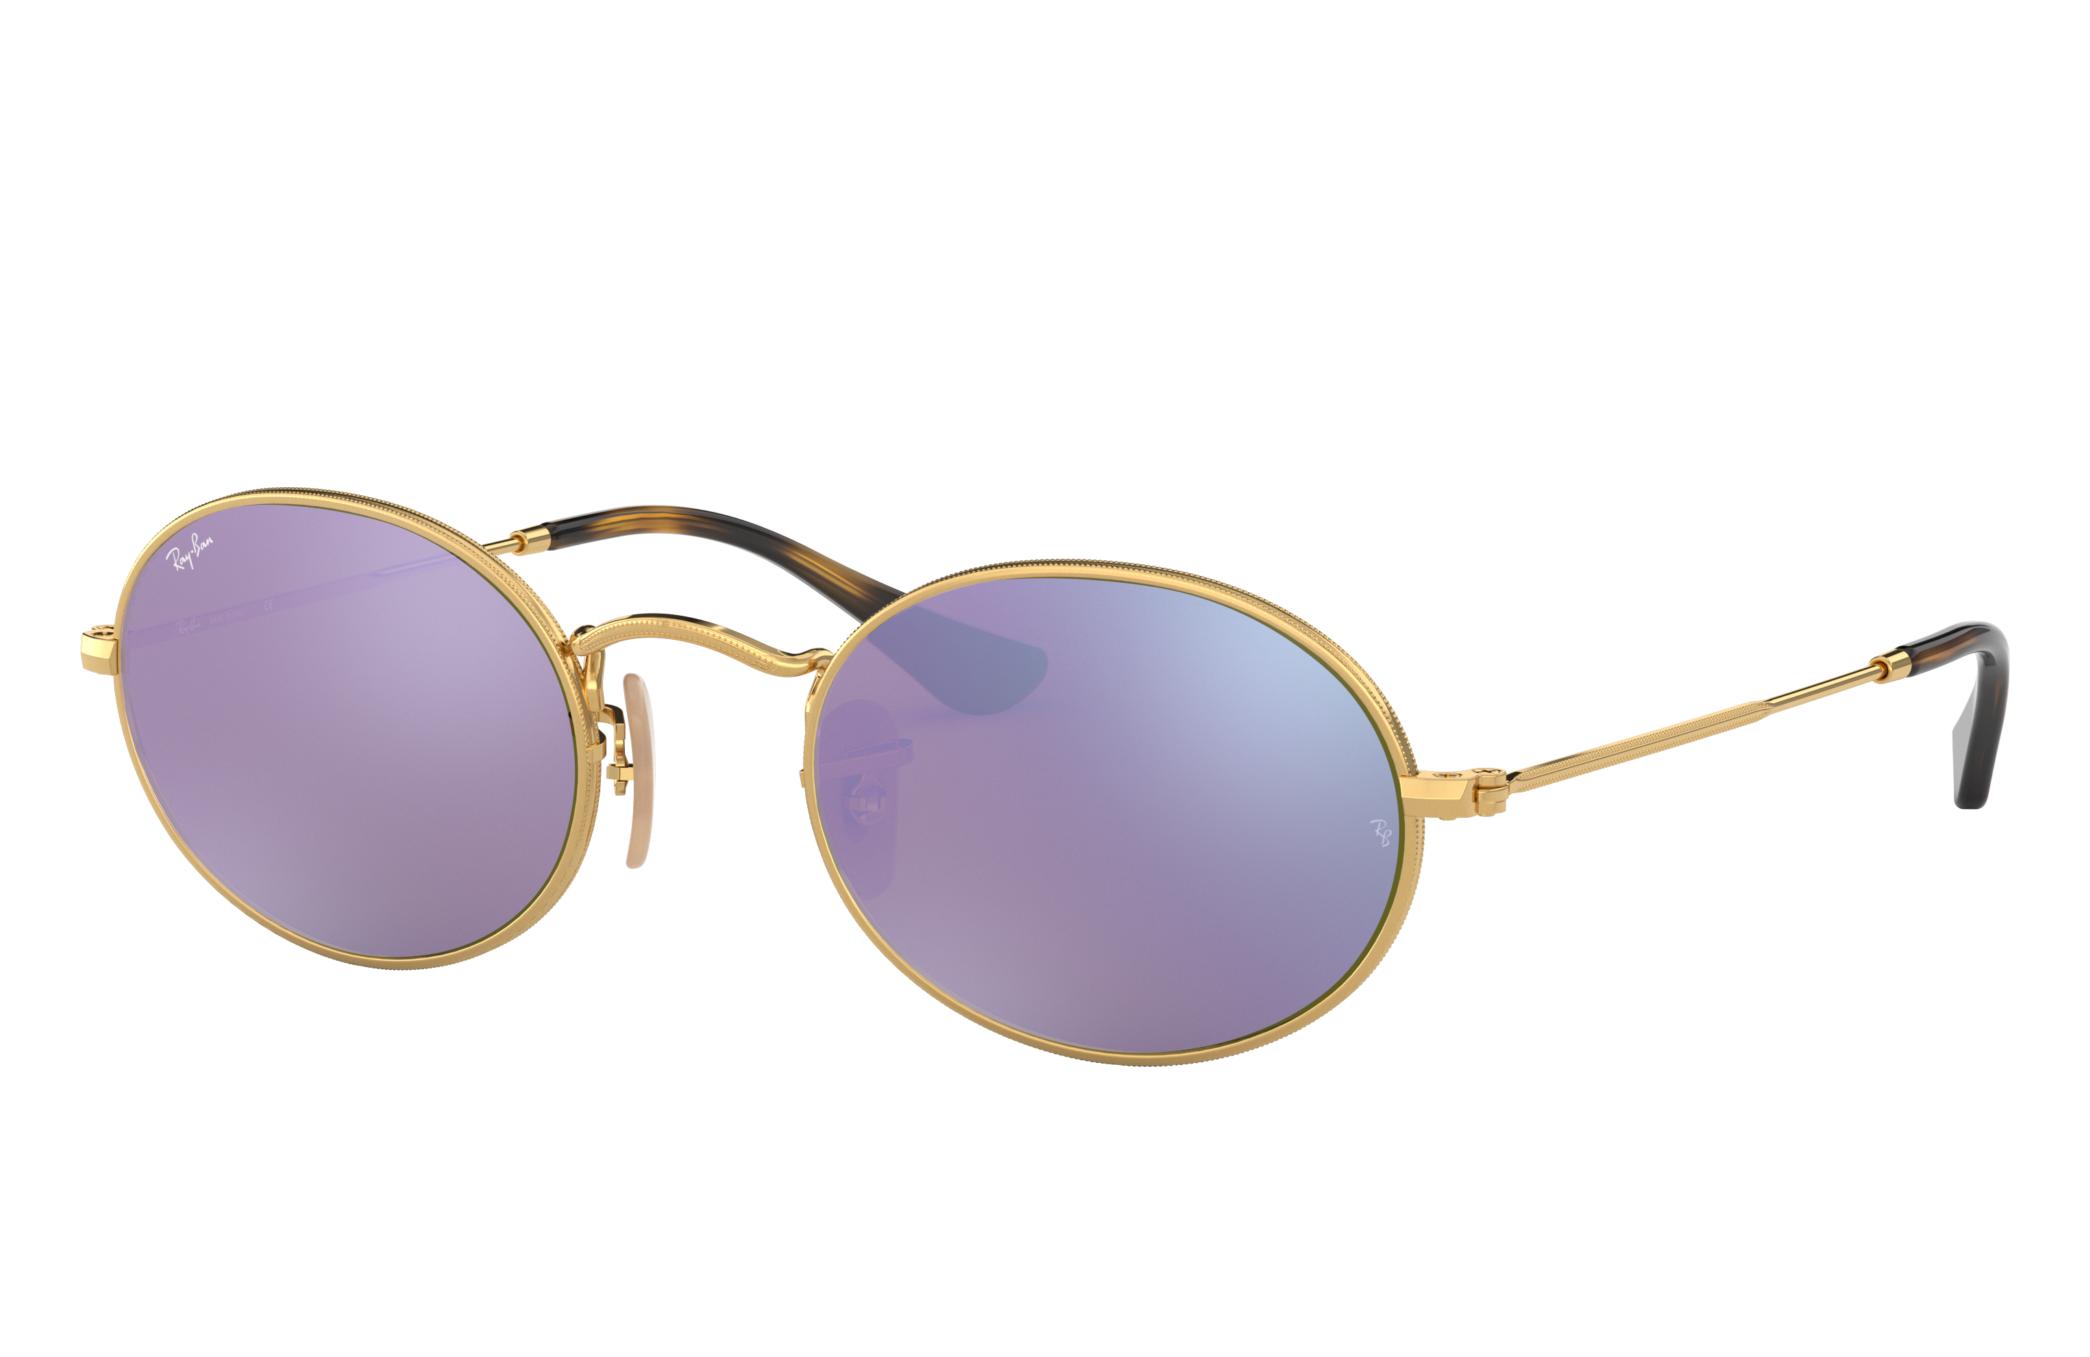 Ray-Ban Oval Flat Lenses Gold, Violet Lenses - RB3547N